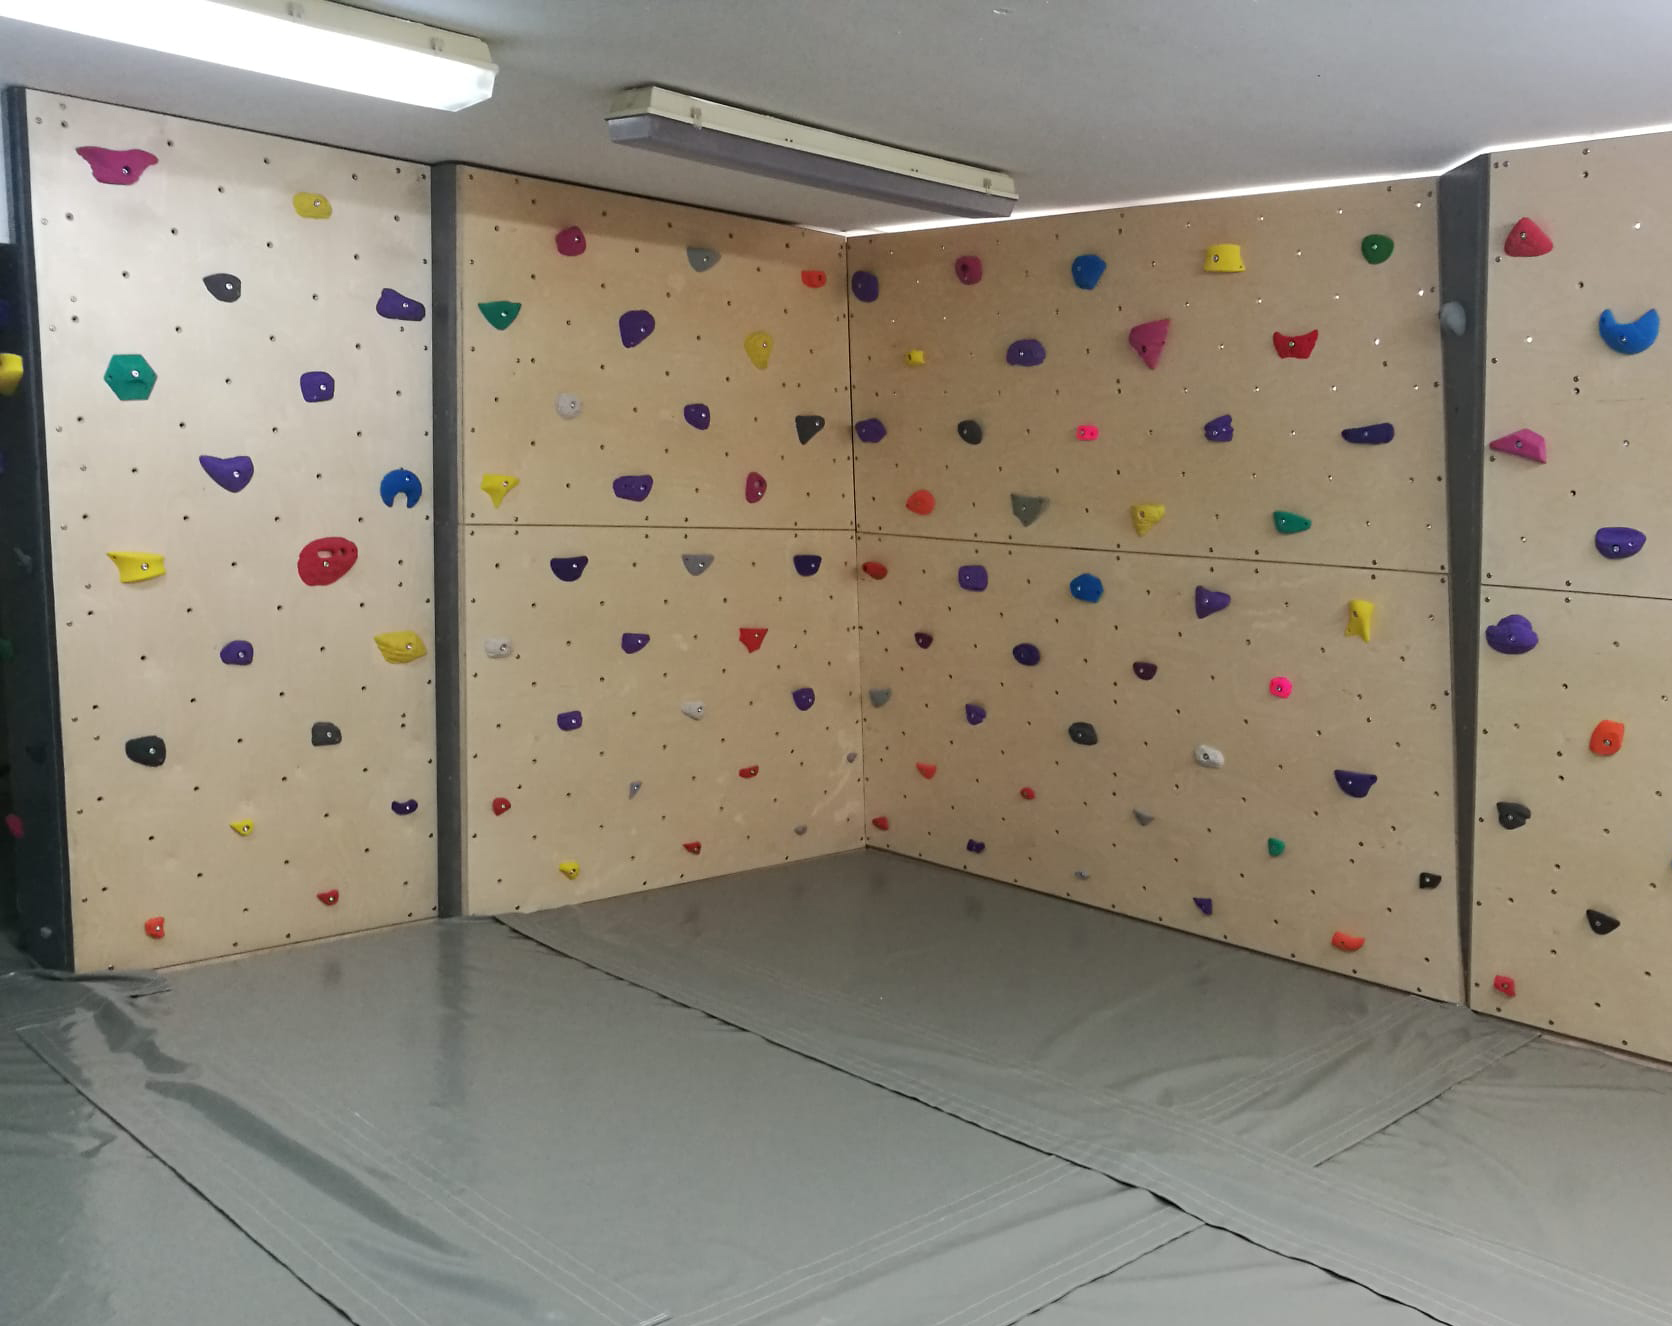 Coria estrena zona de escalada